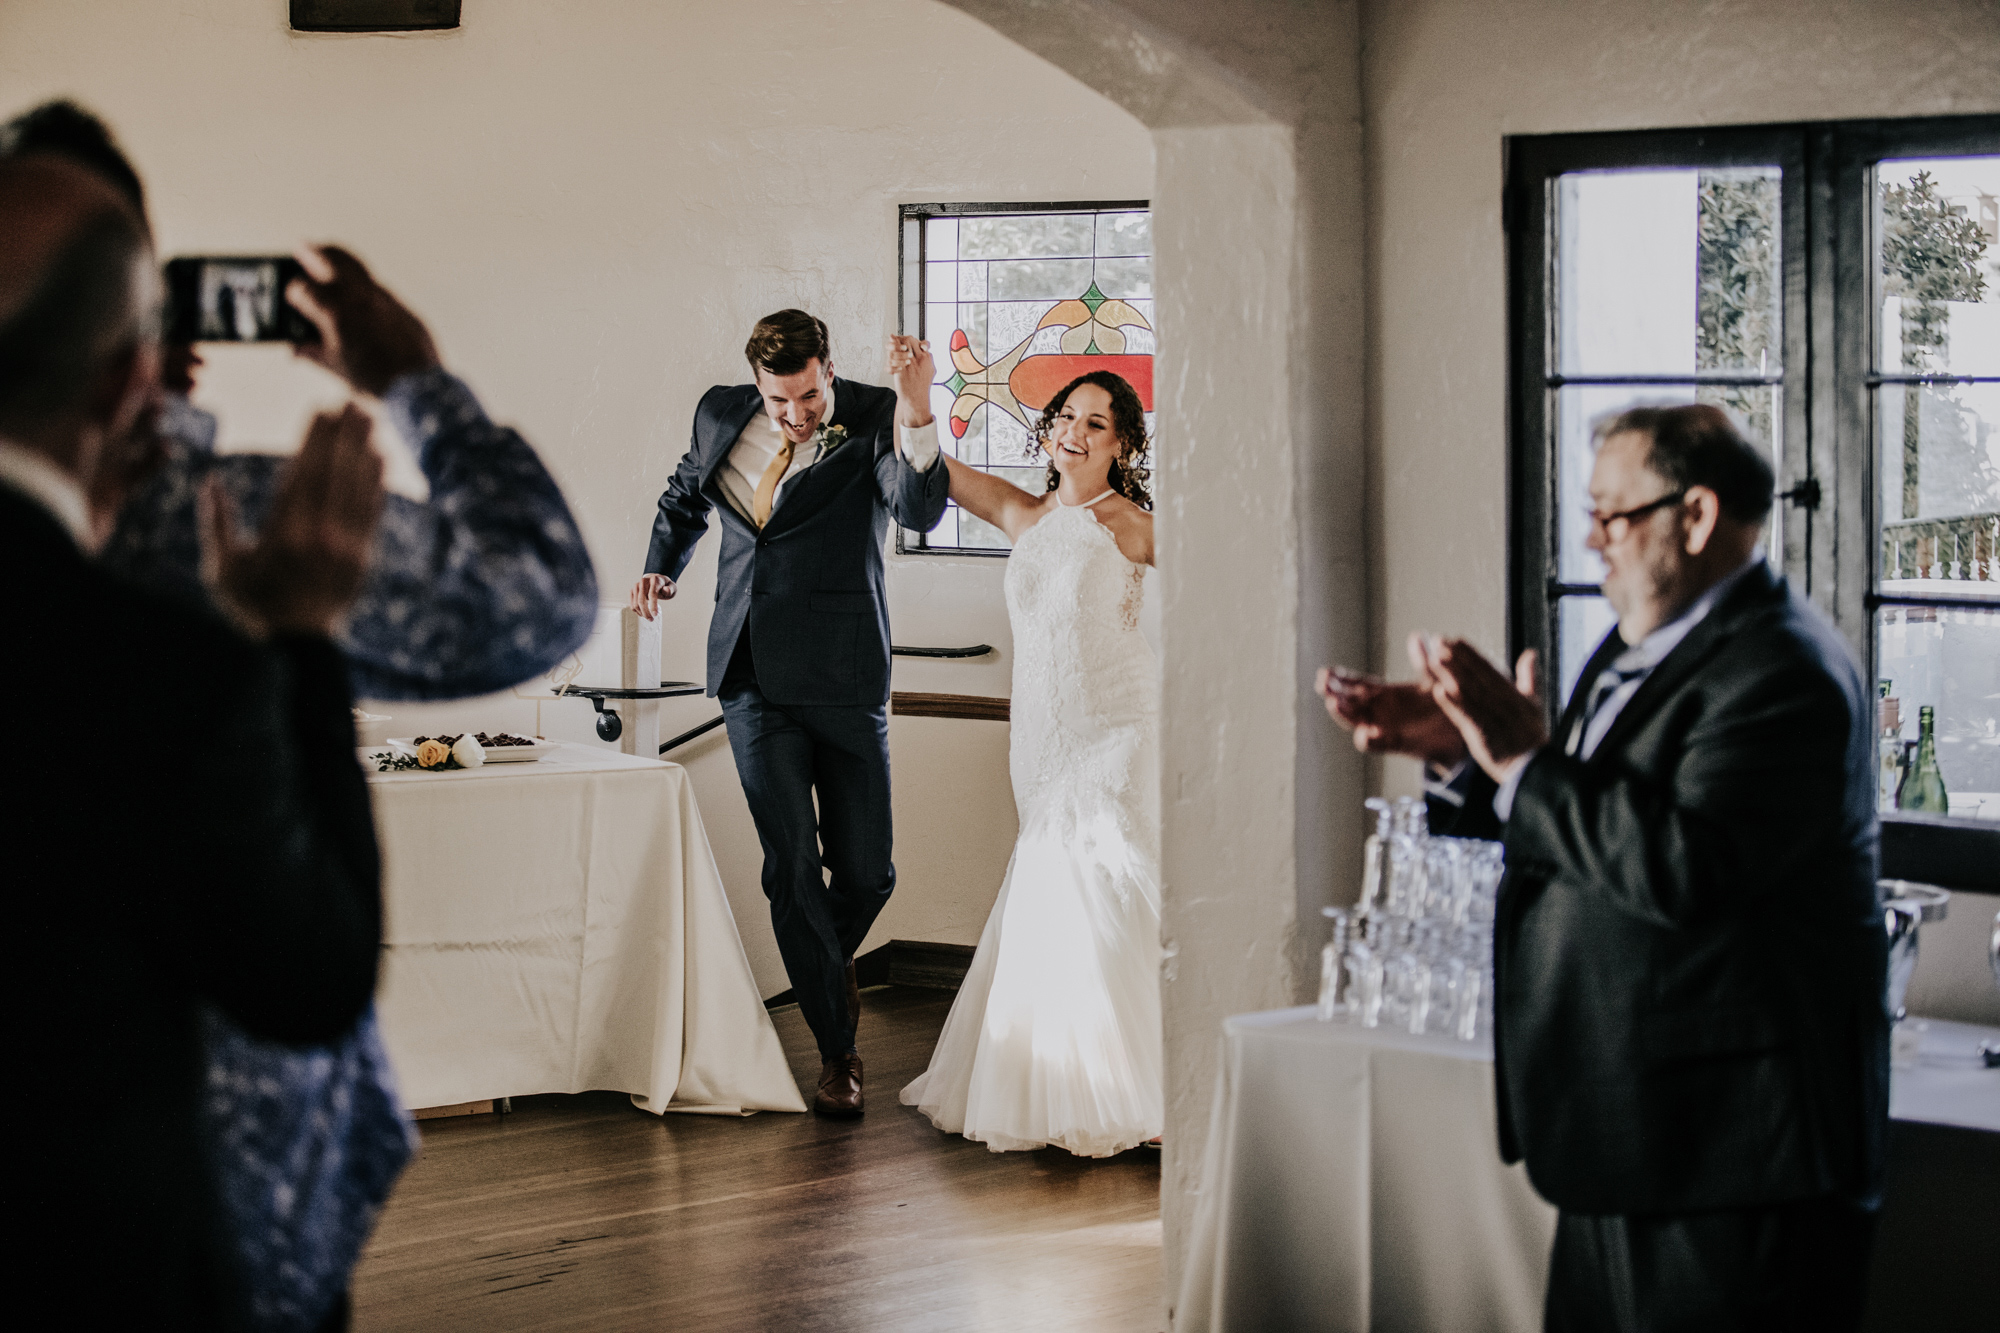 108-destination-wedding-san-clemente-california.jpg